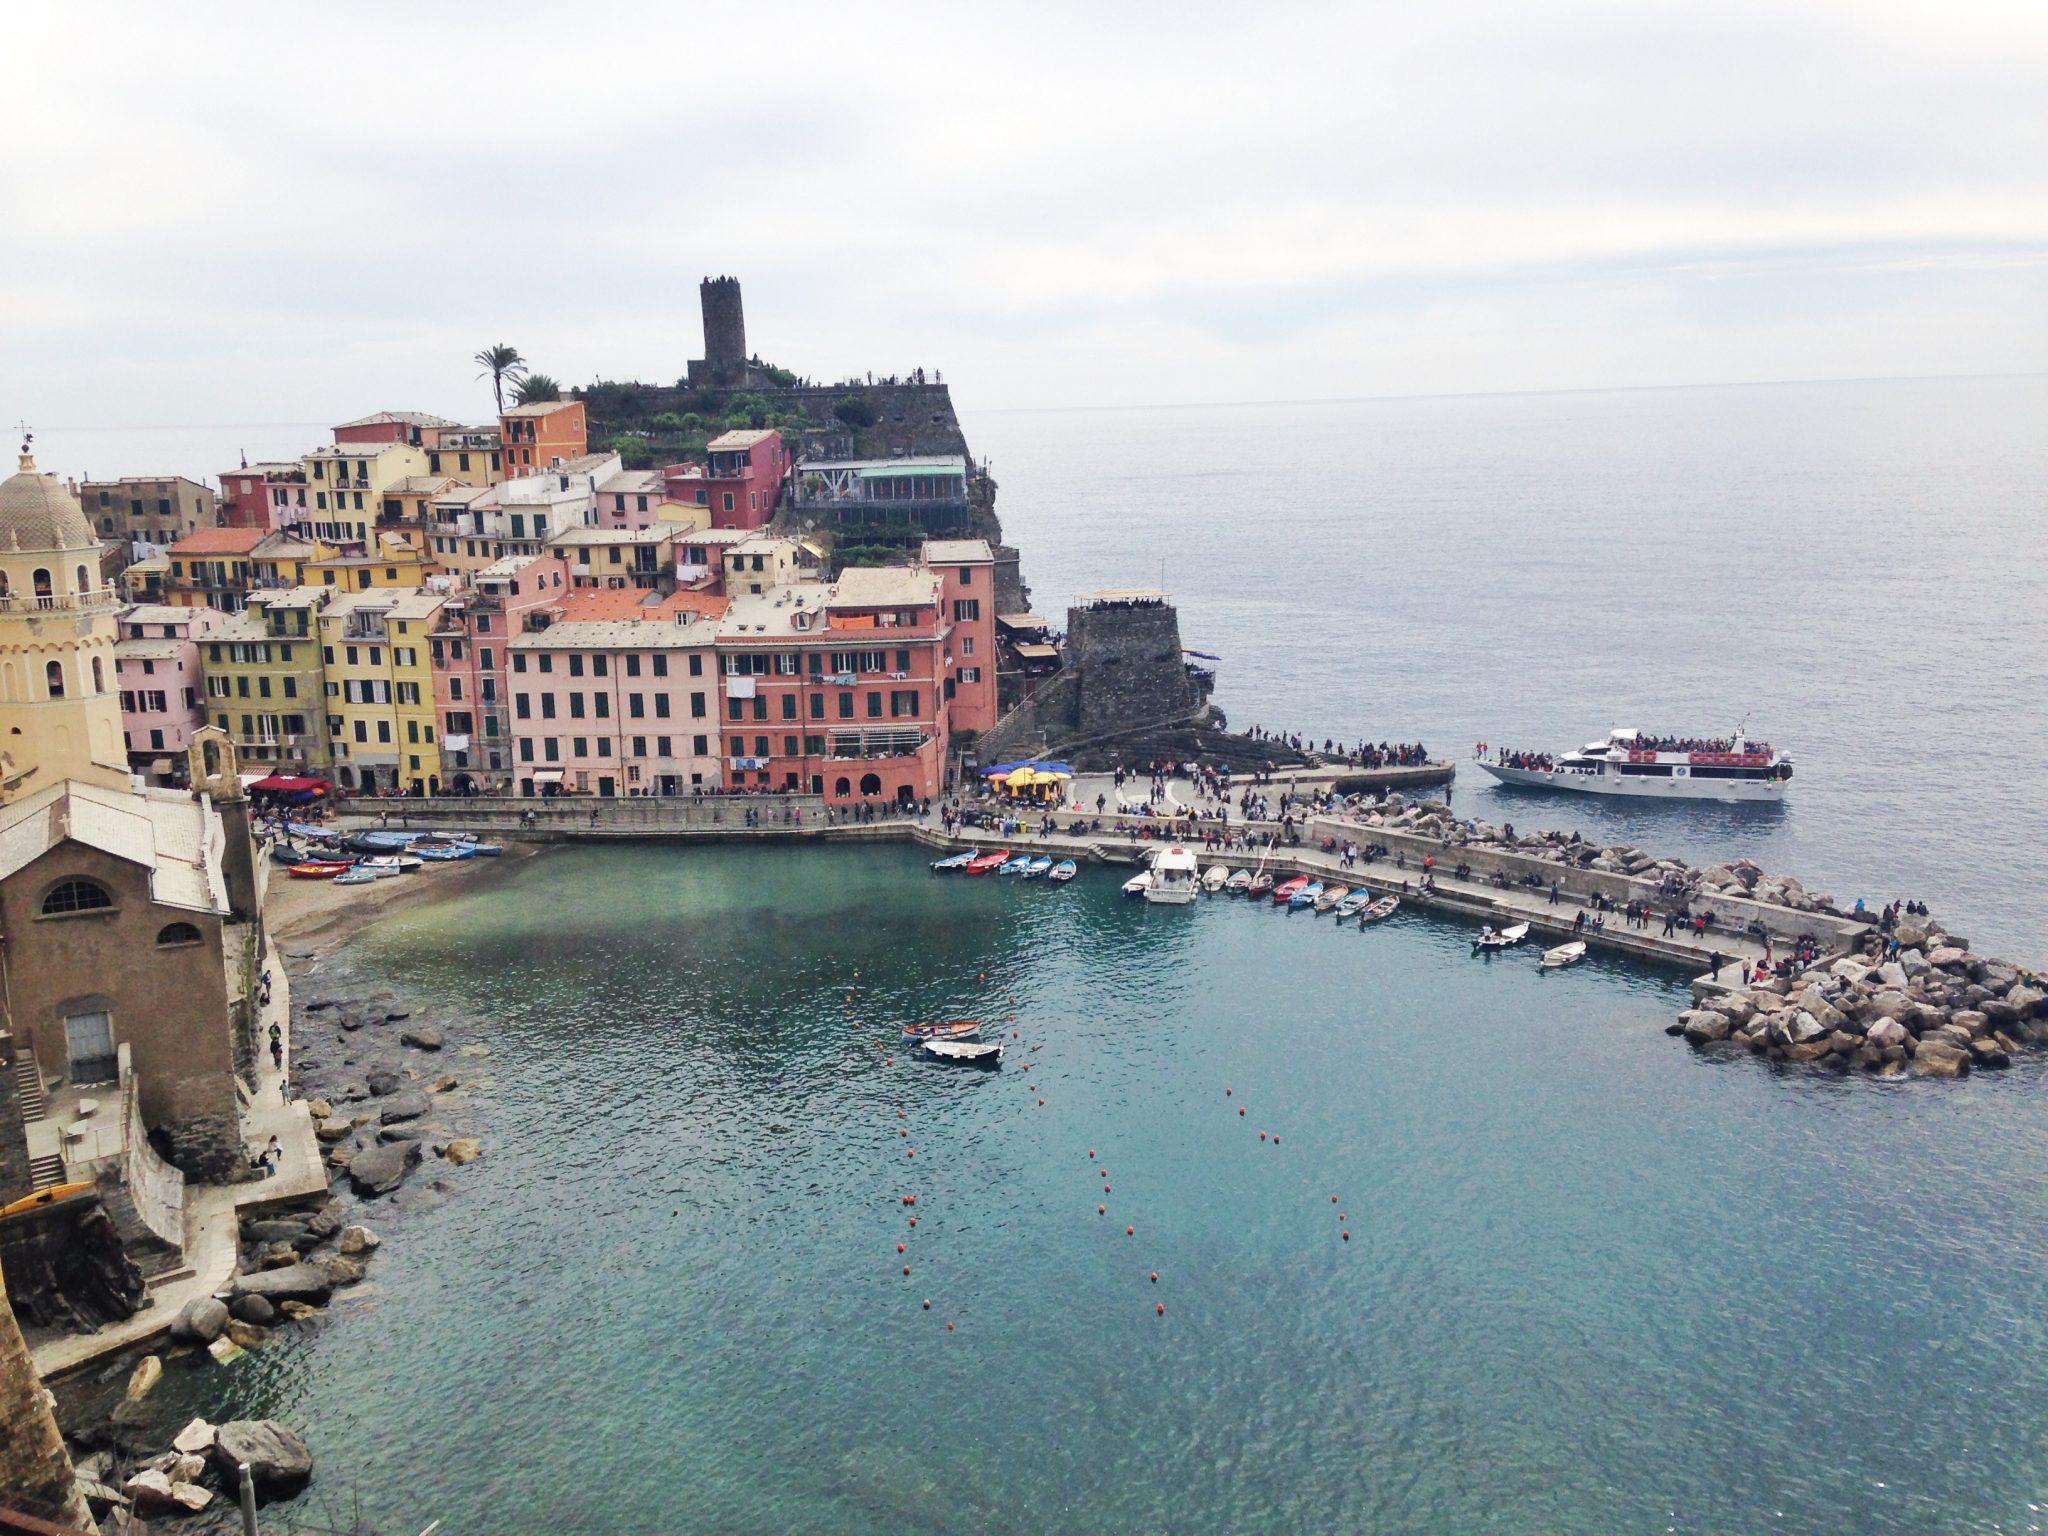 Destination: Cinque Terre